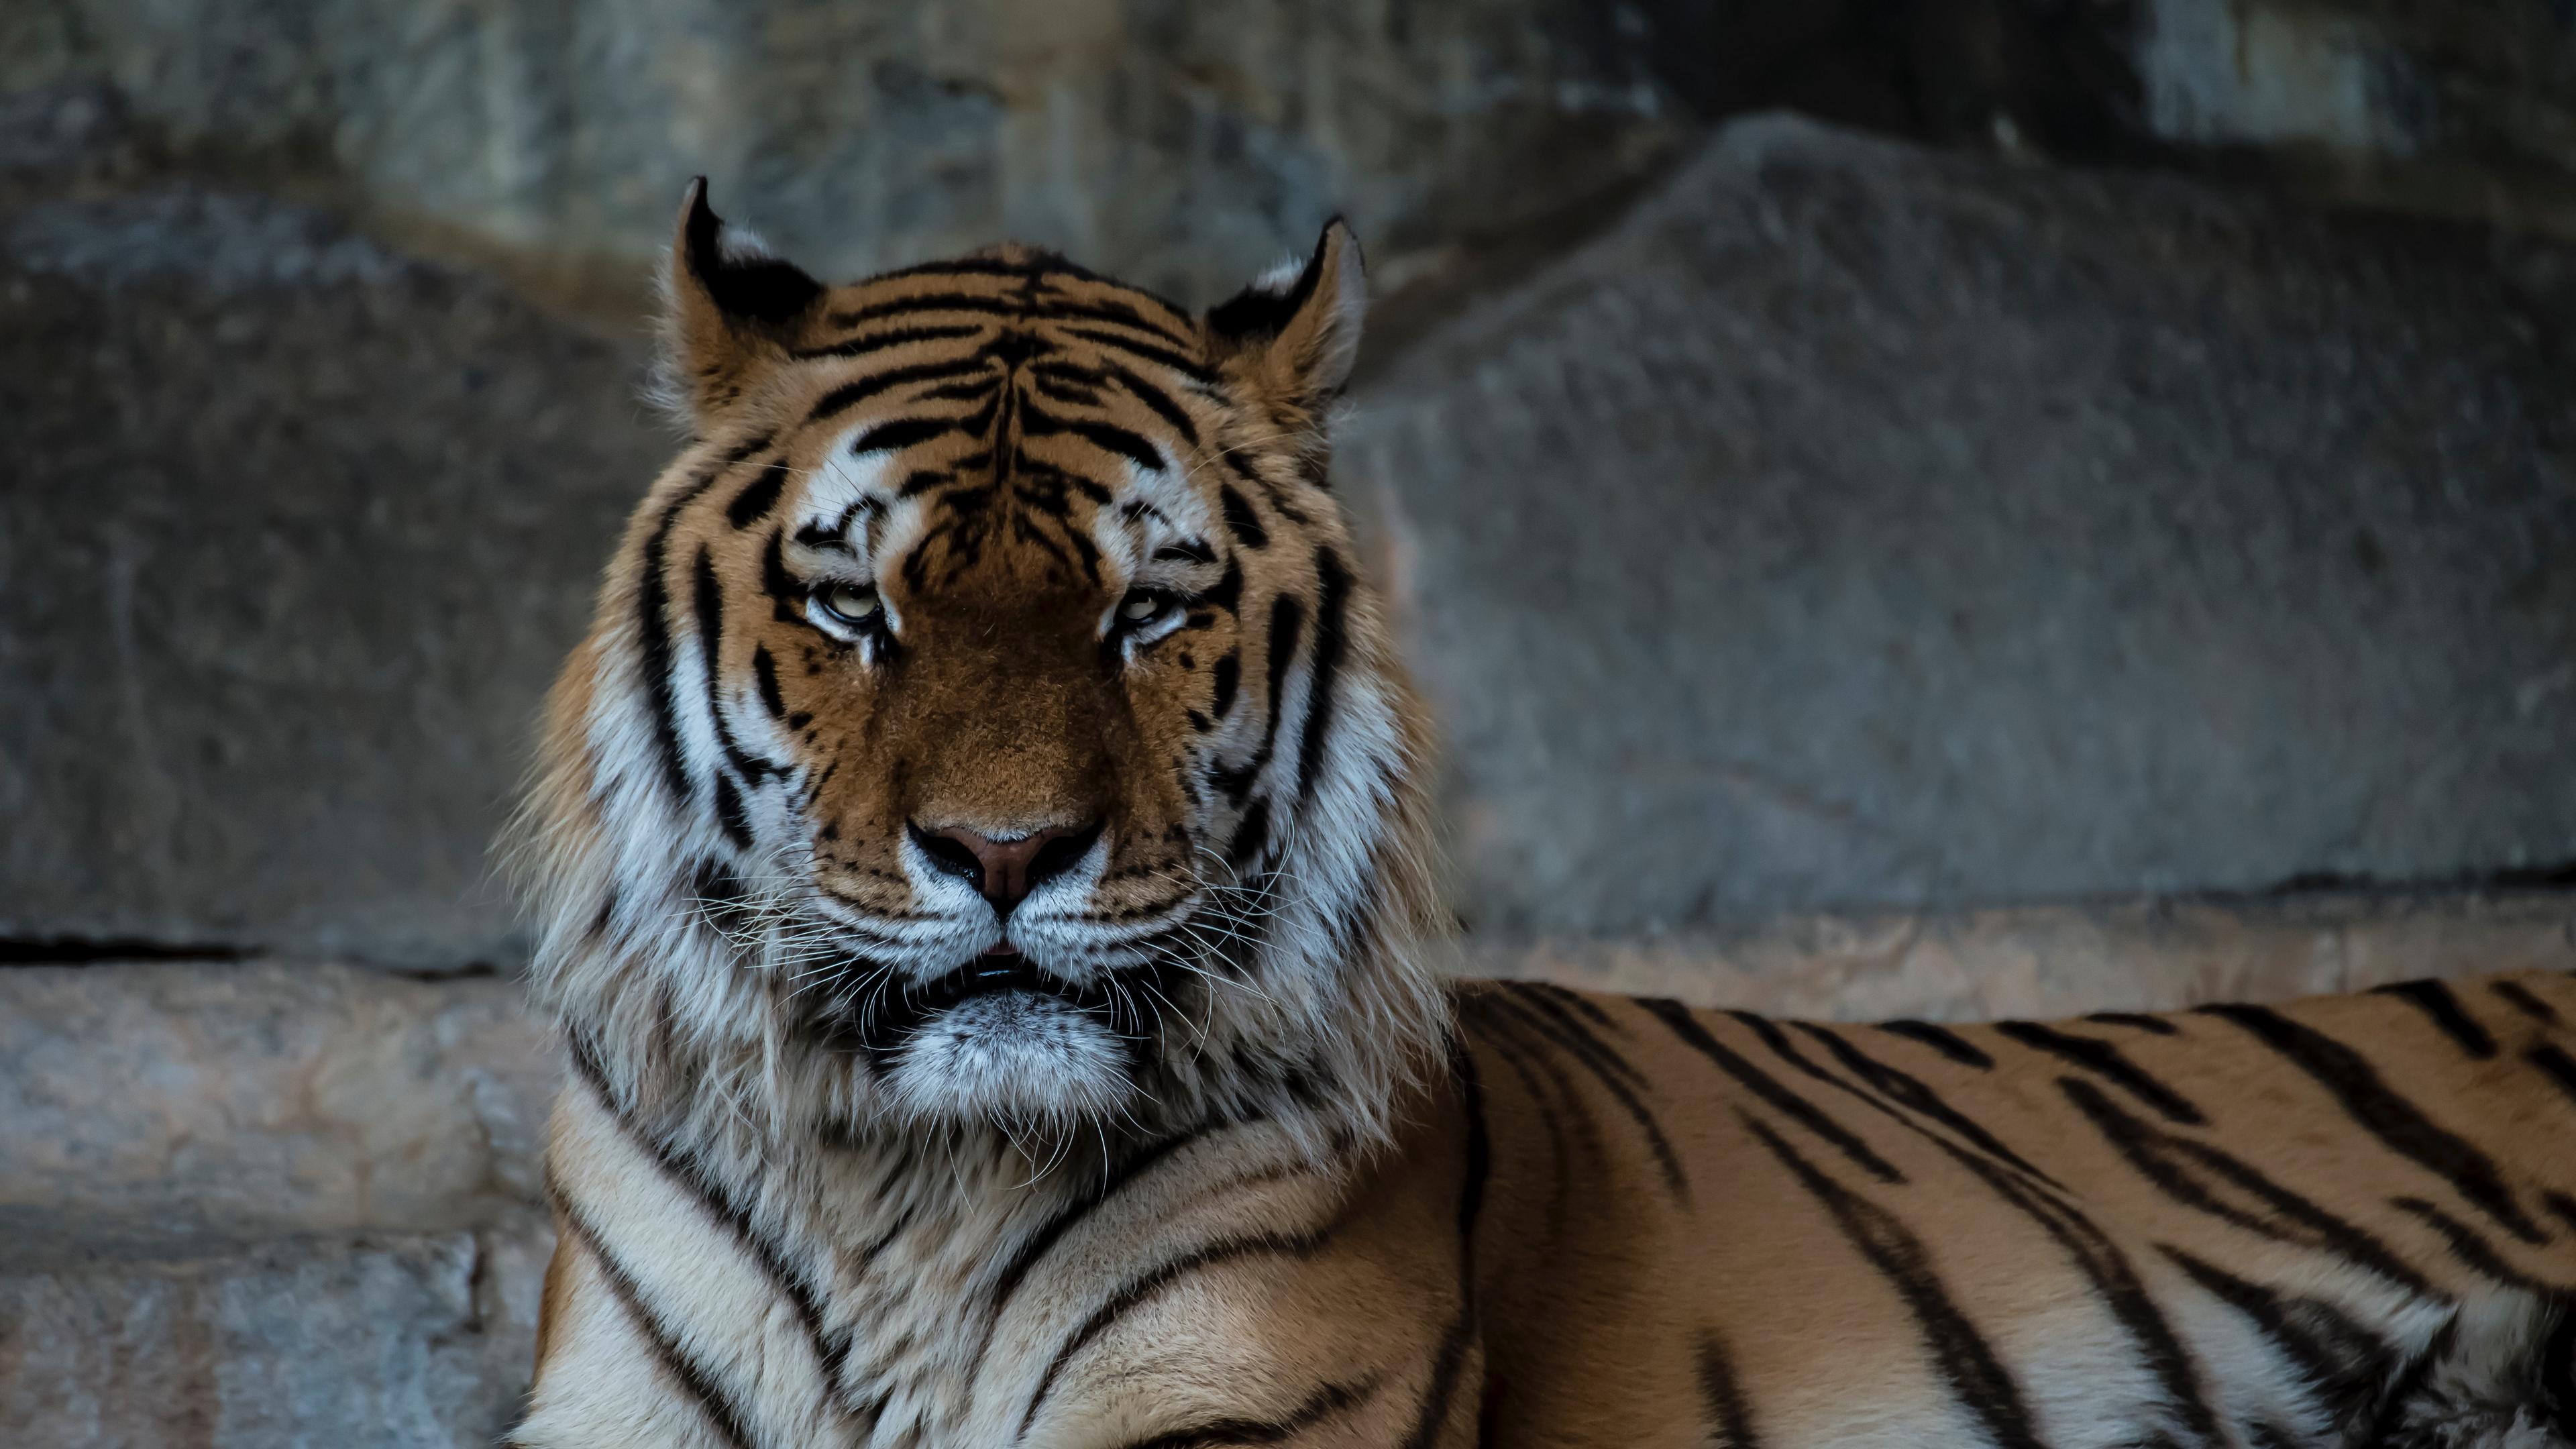 tiger predator muzzle big cat 4k 1542242042 - tiger, predator, muzzle, big cat 4k - Tiger, Predator, muzzle